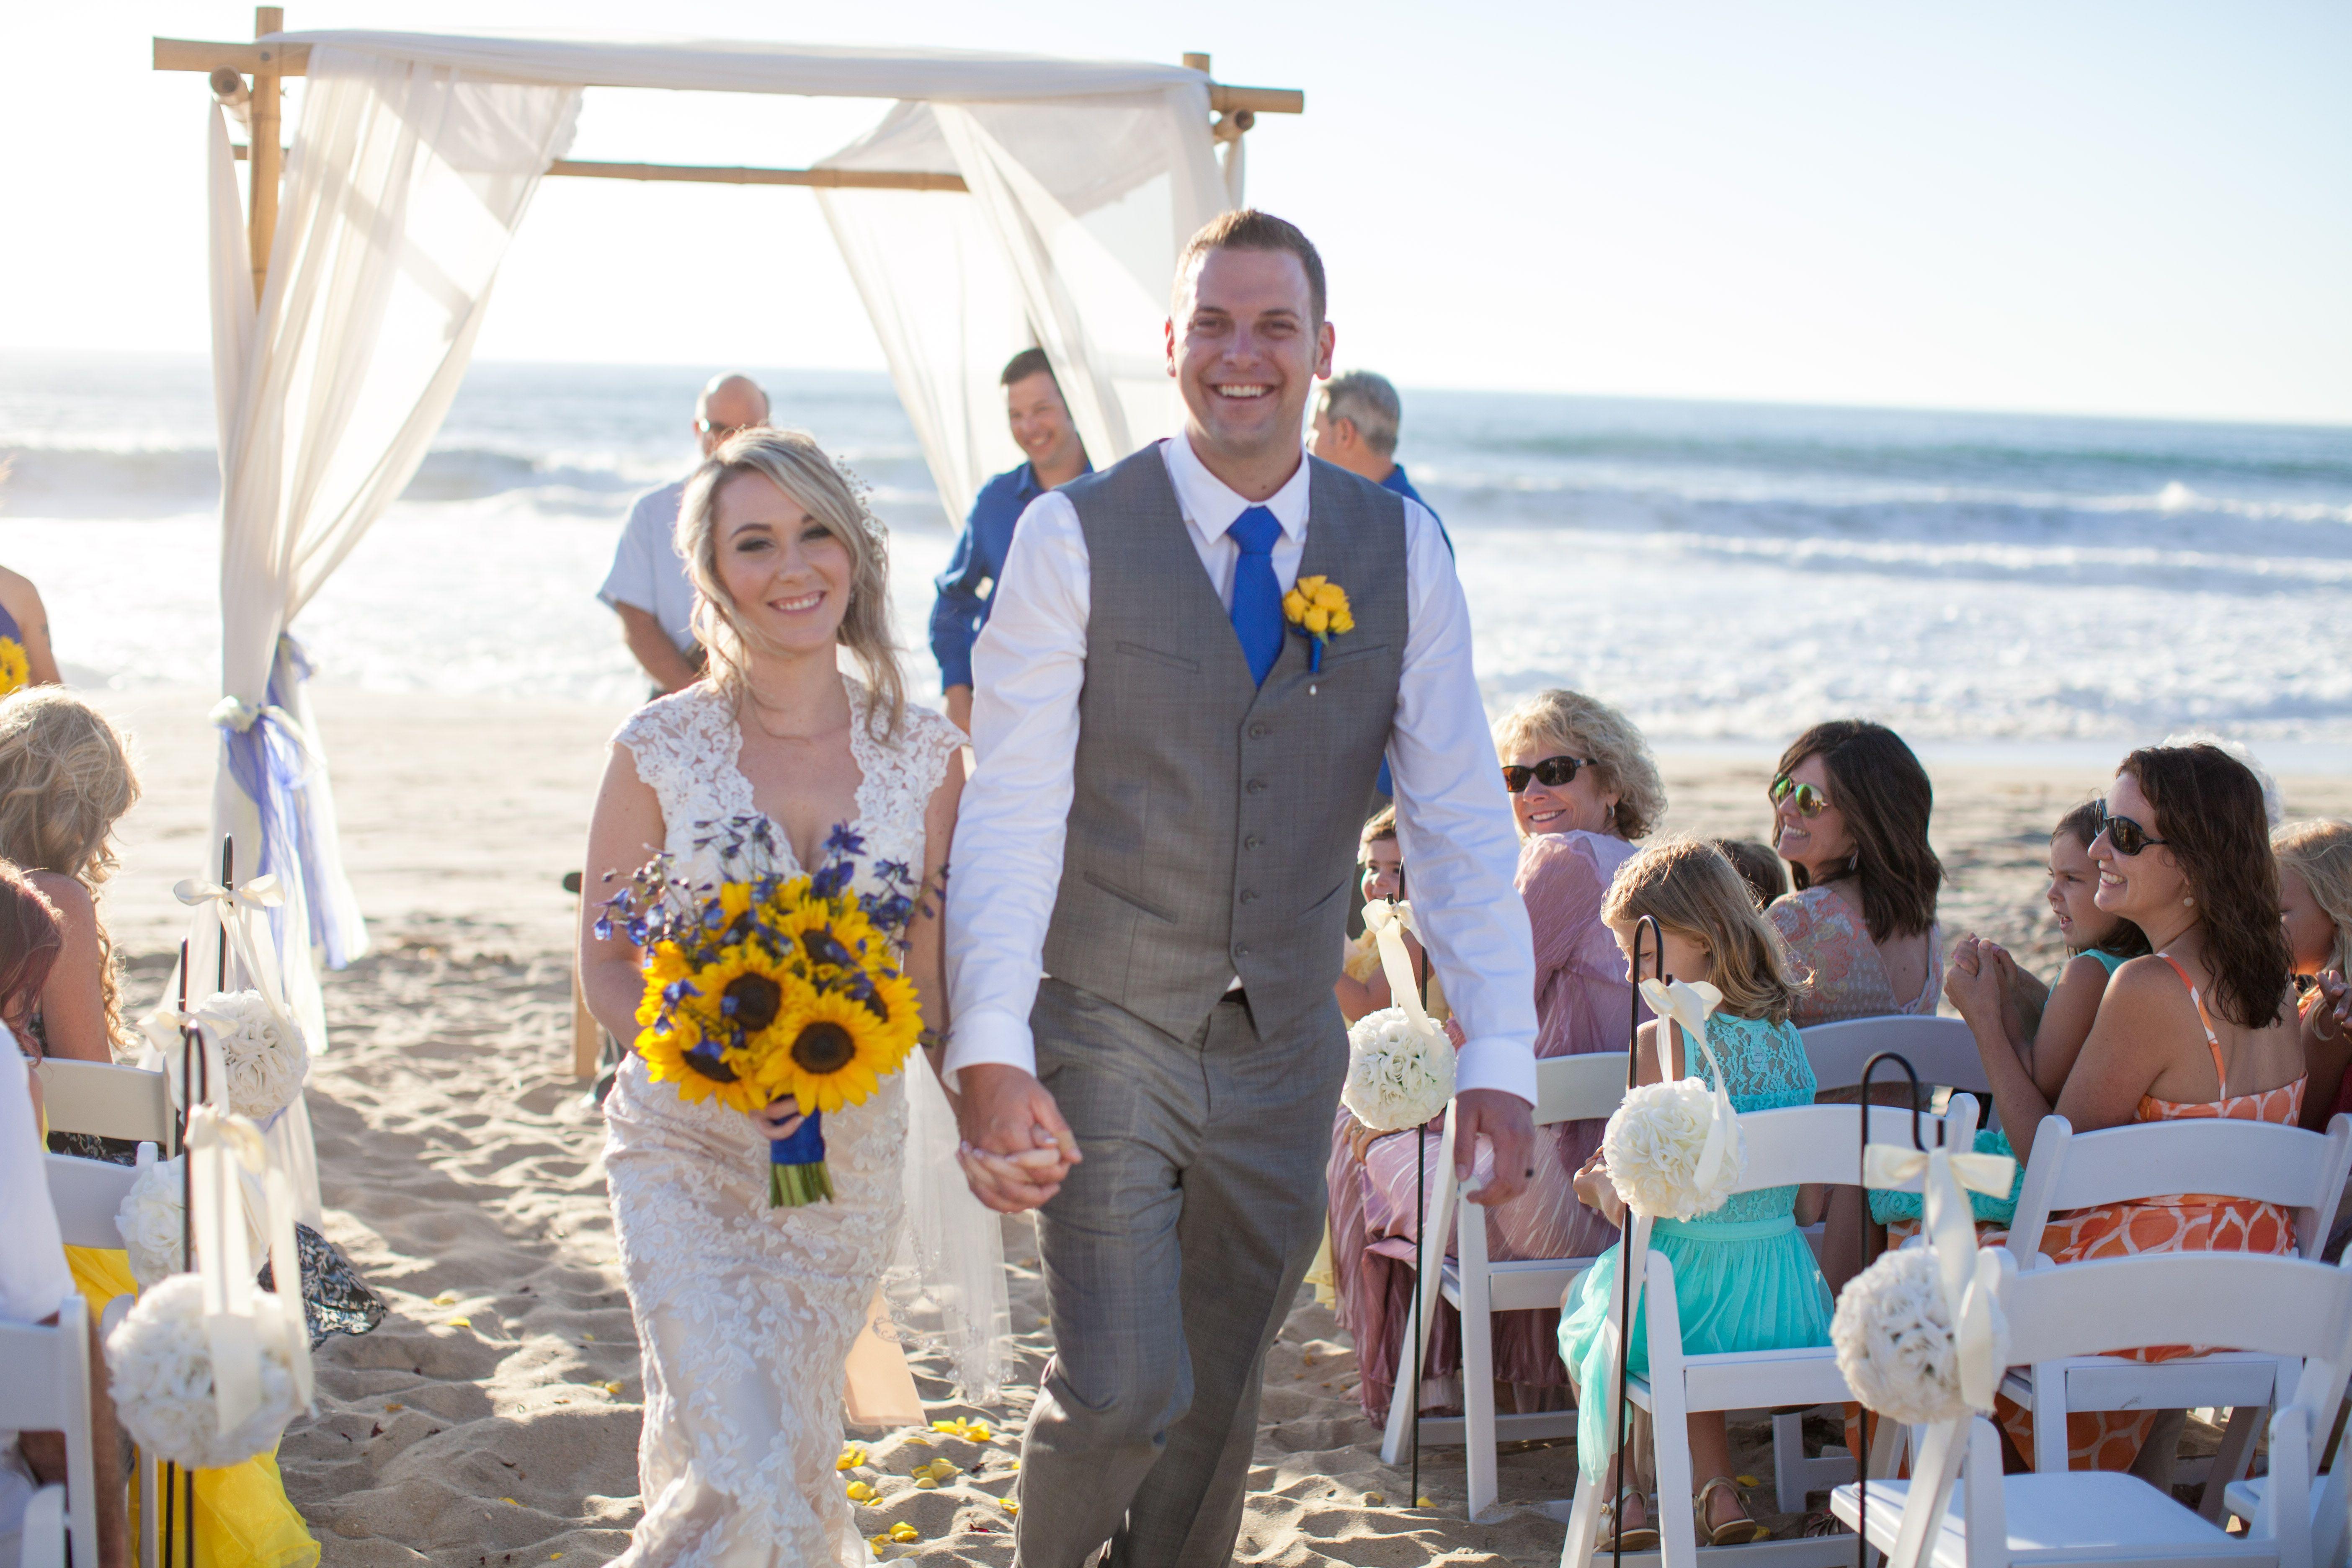 Pin By Dream Beach Wedding San Dieg On Canopies By Dream Beach Wedding San Diego Dream Beach Wedding San Diego Wedding Venues Dream Beach